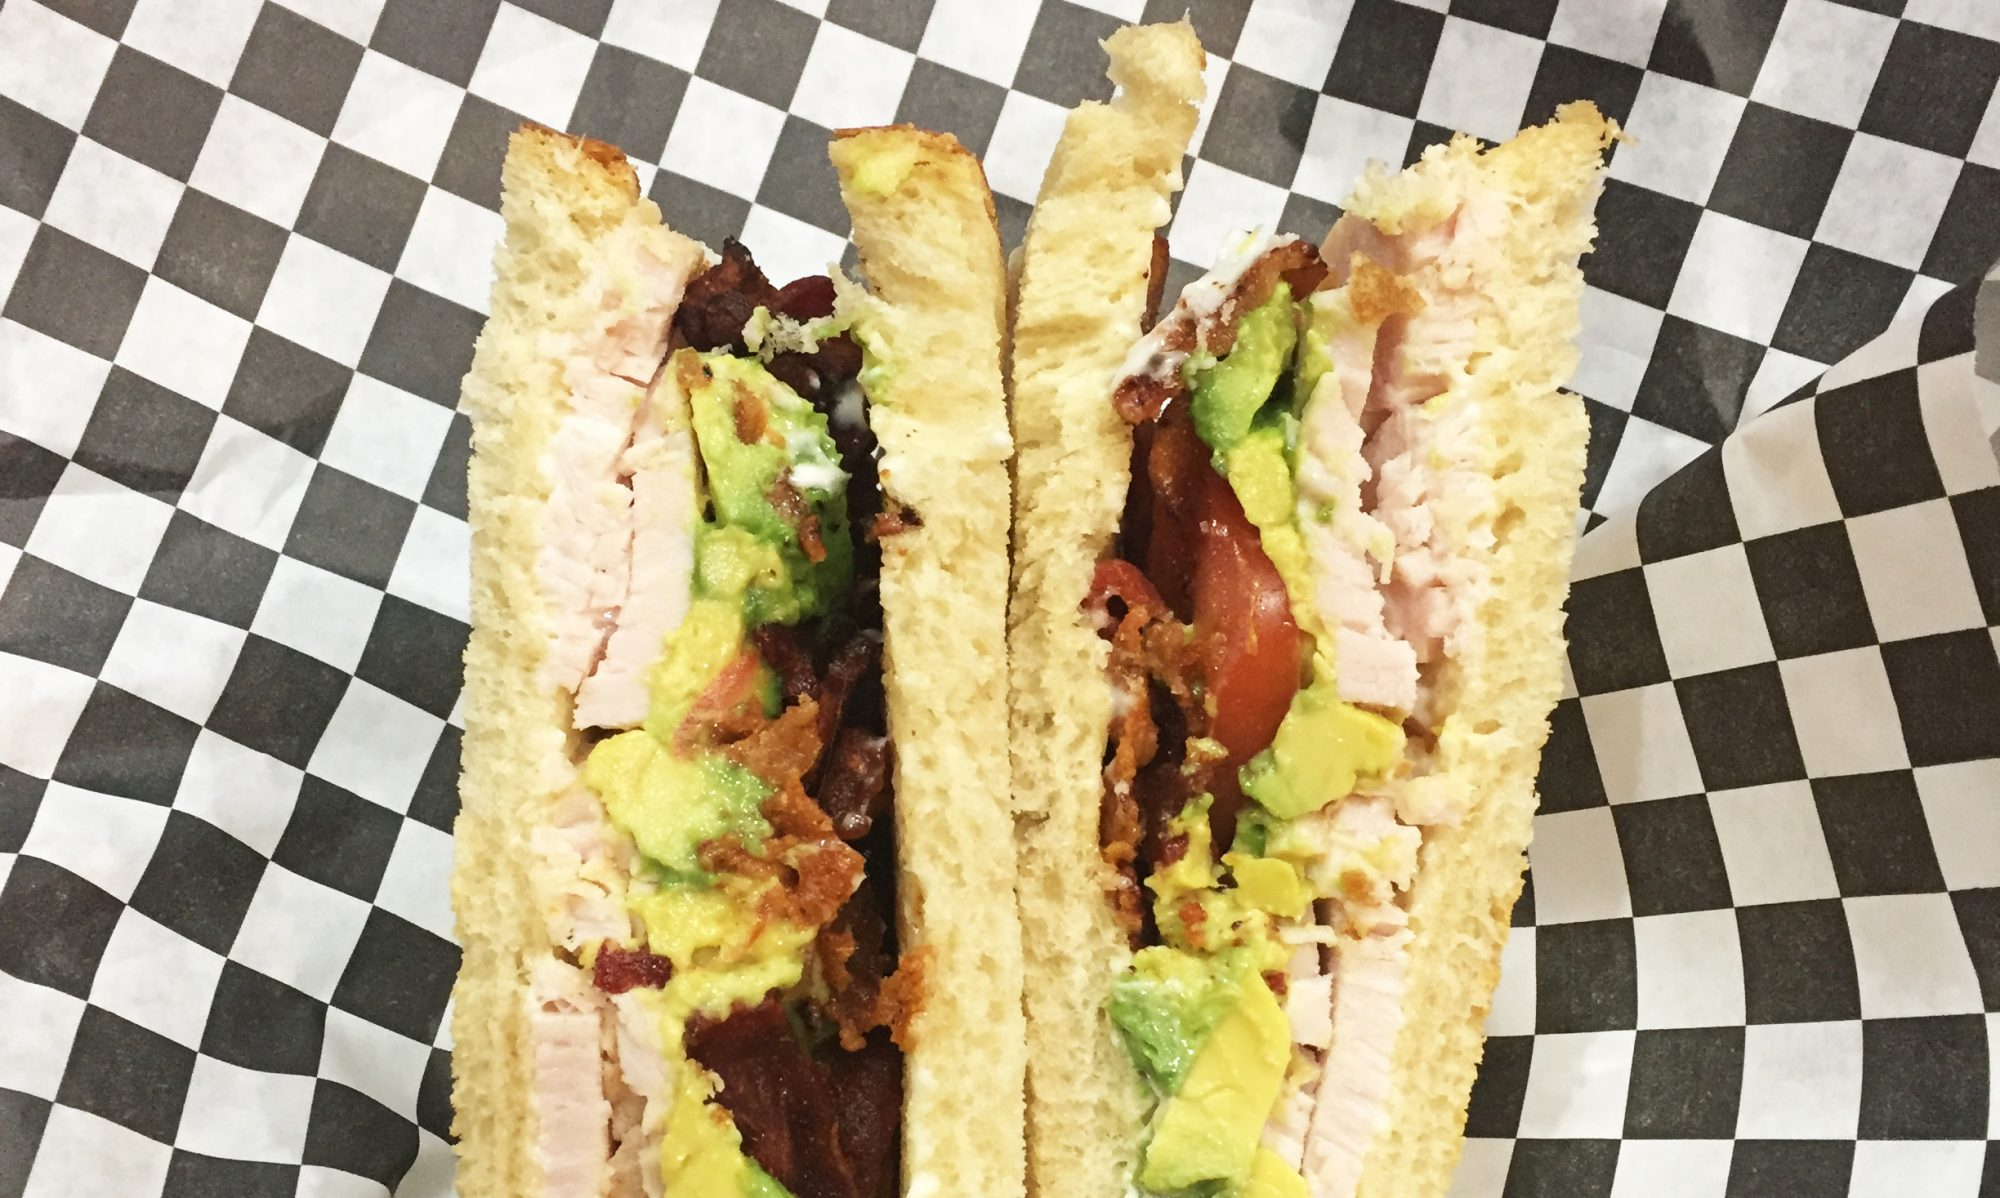 Grinder Sandwich Company, Inc.